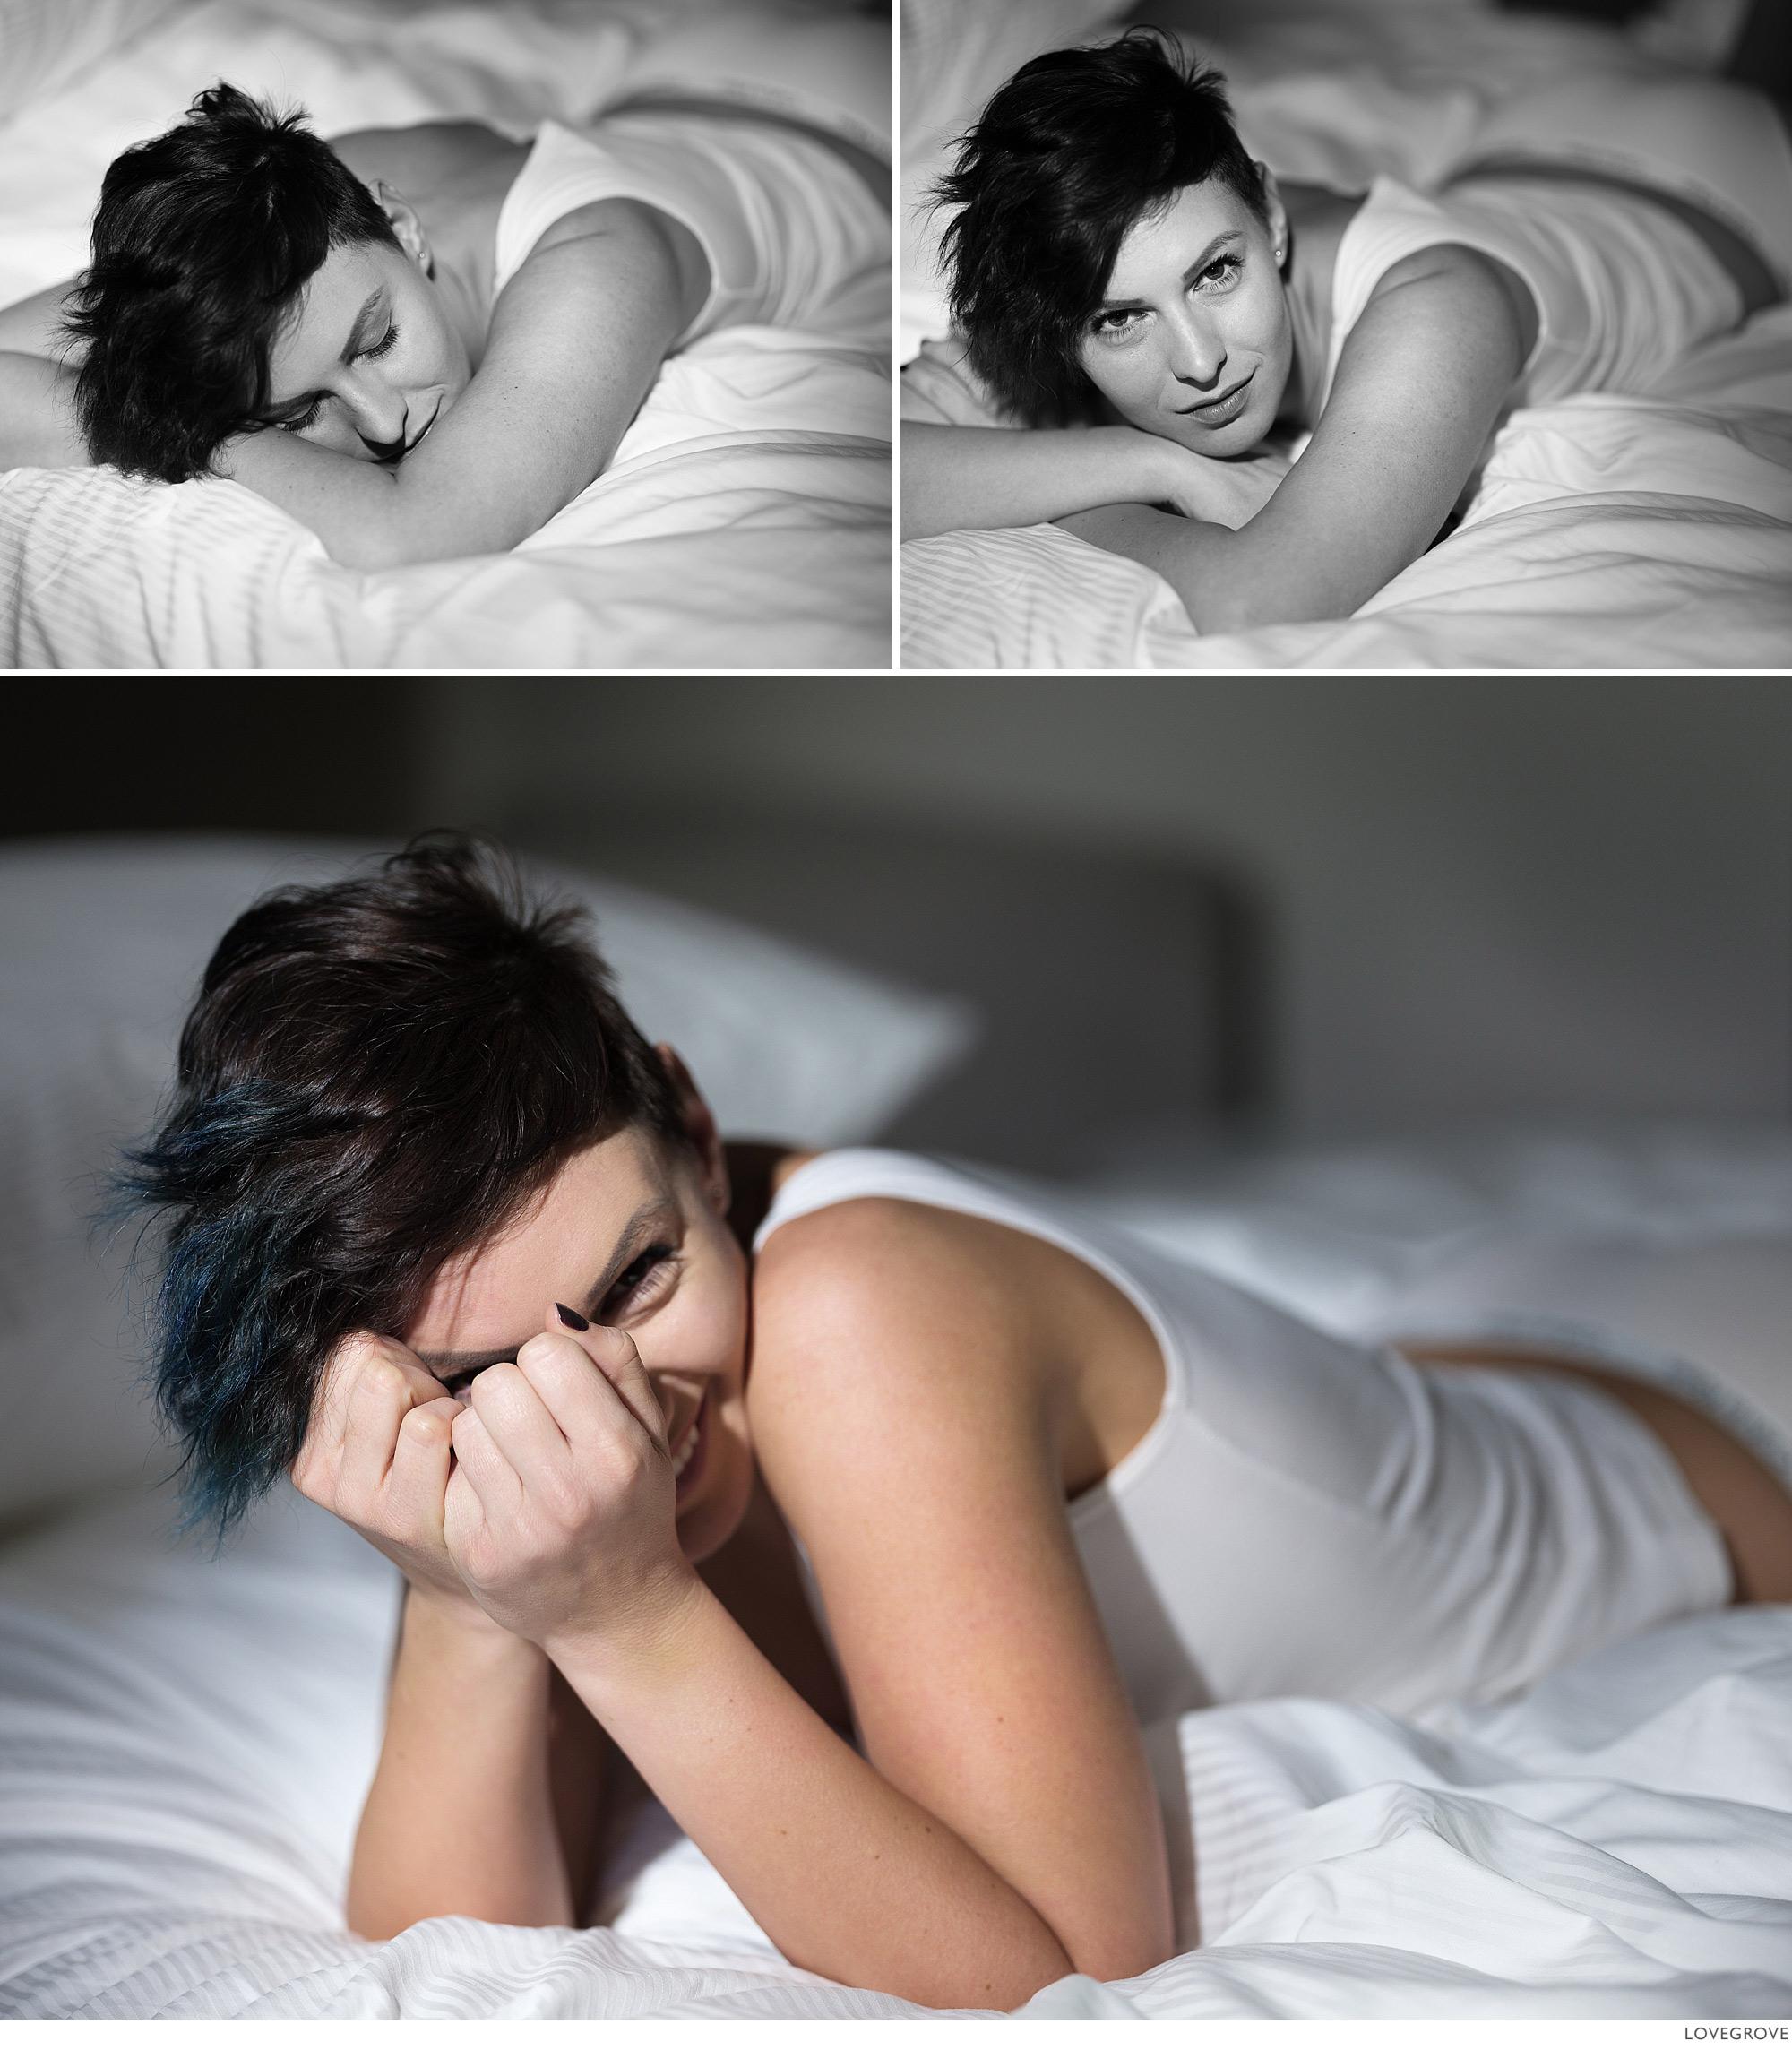 Misha on the bed